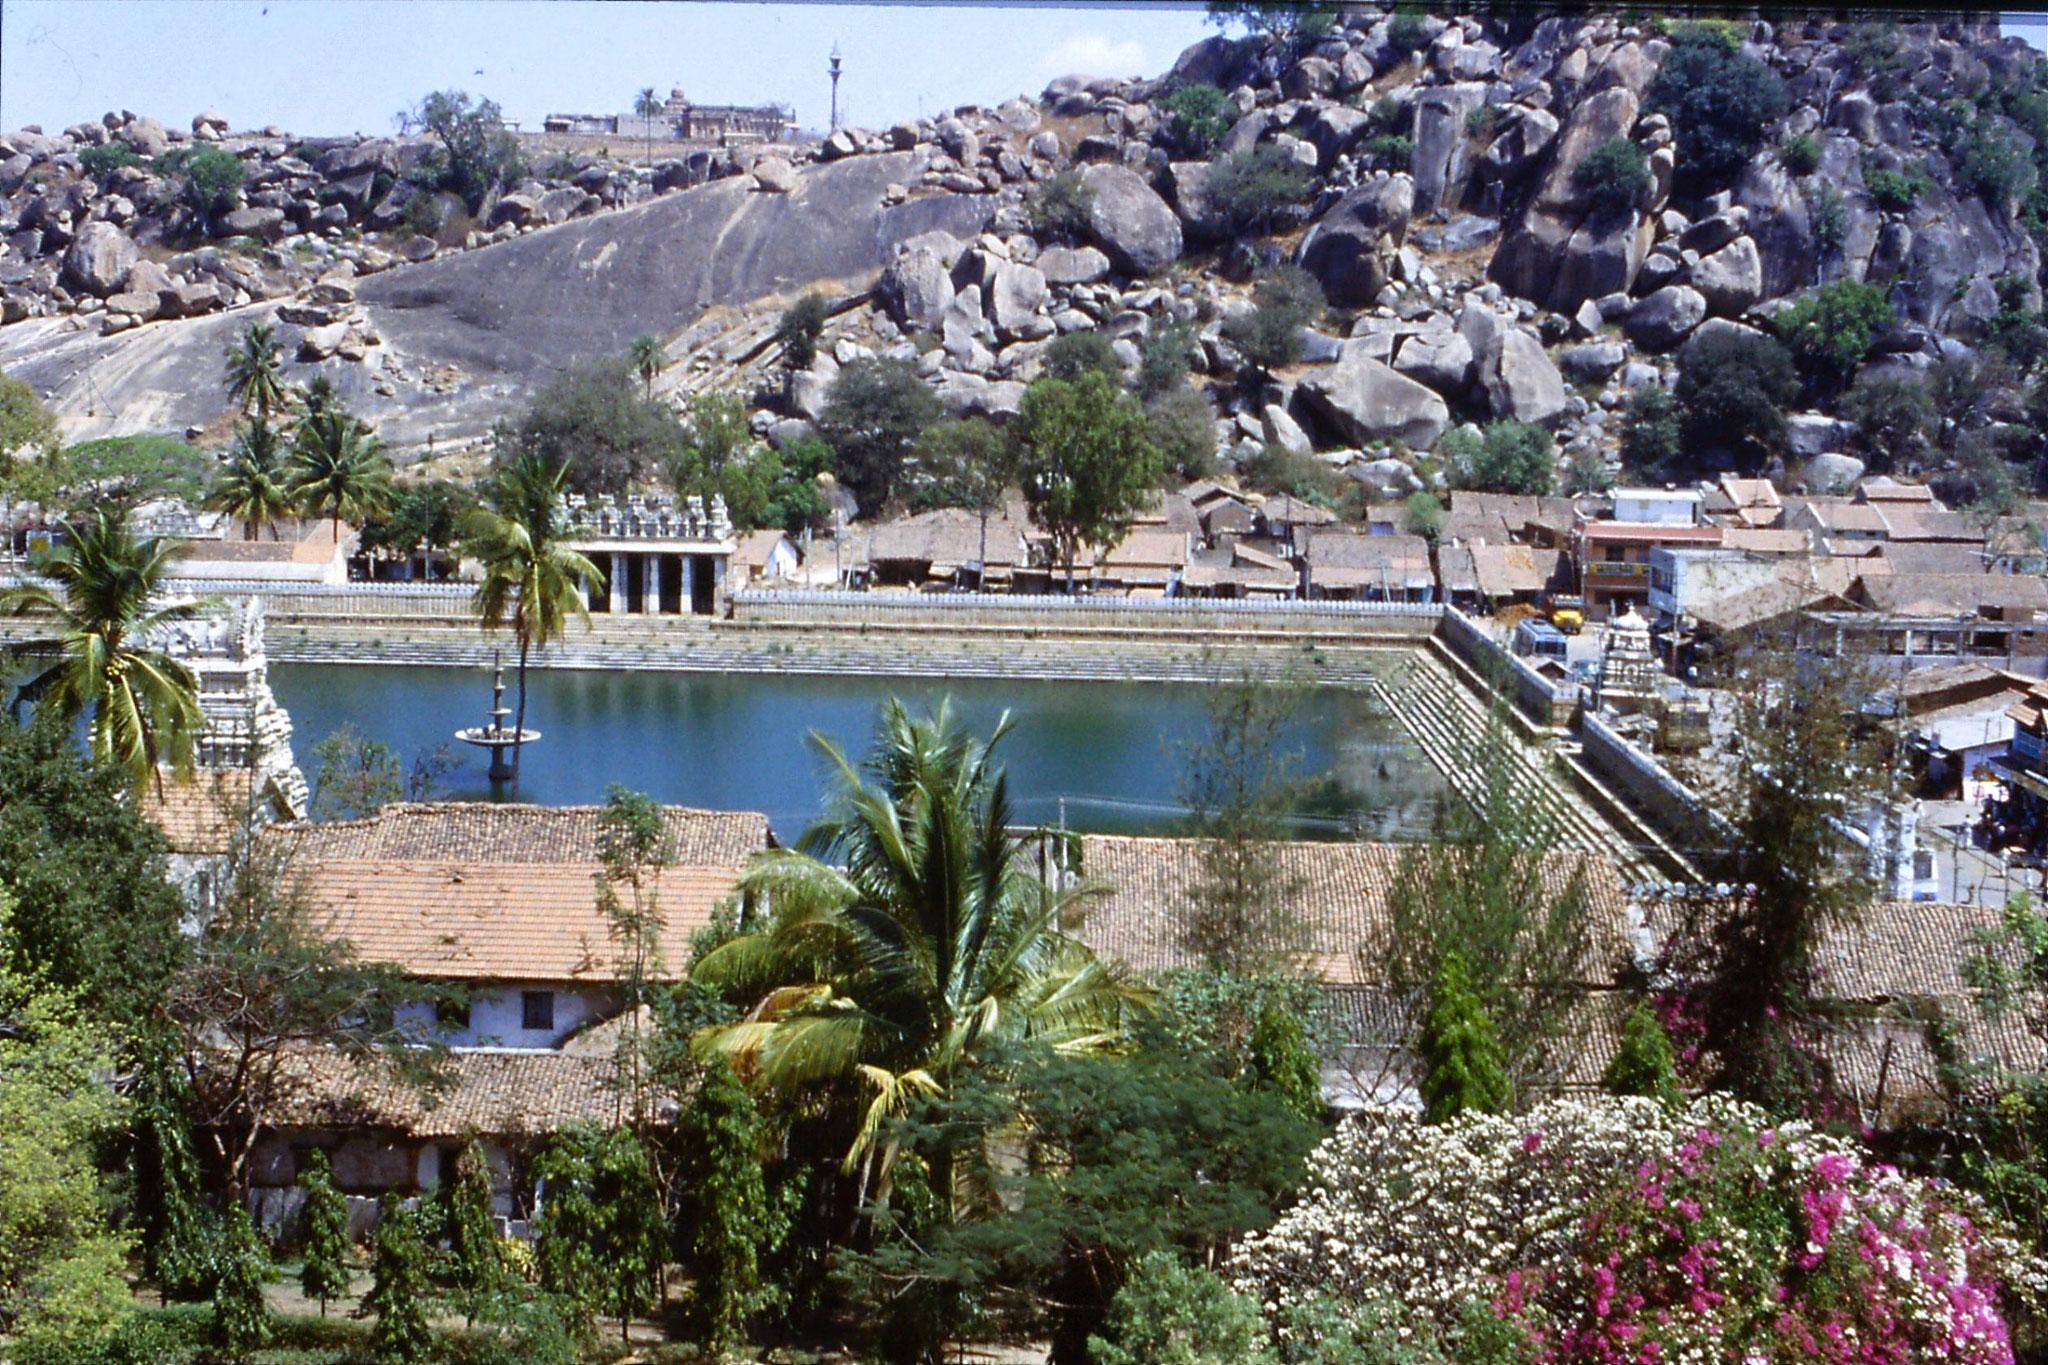 108/14: 13/3/1990 Sravanabelagola - tank, temple on hill behind